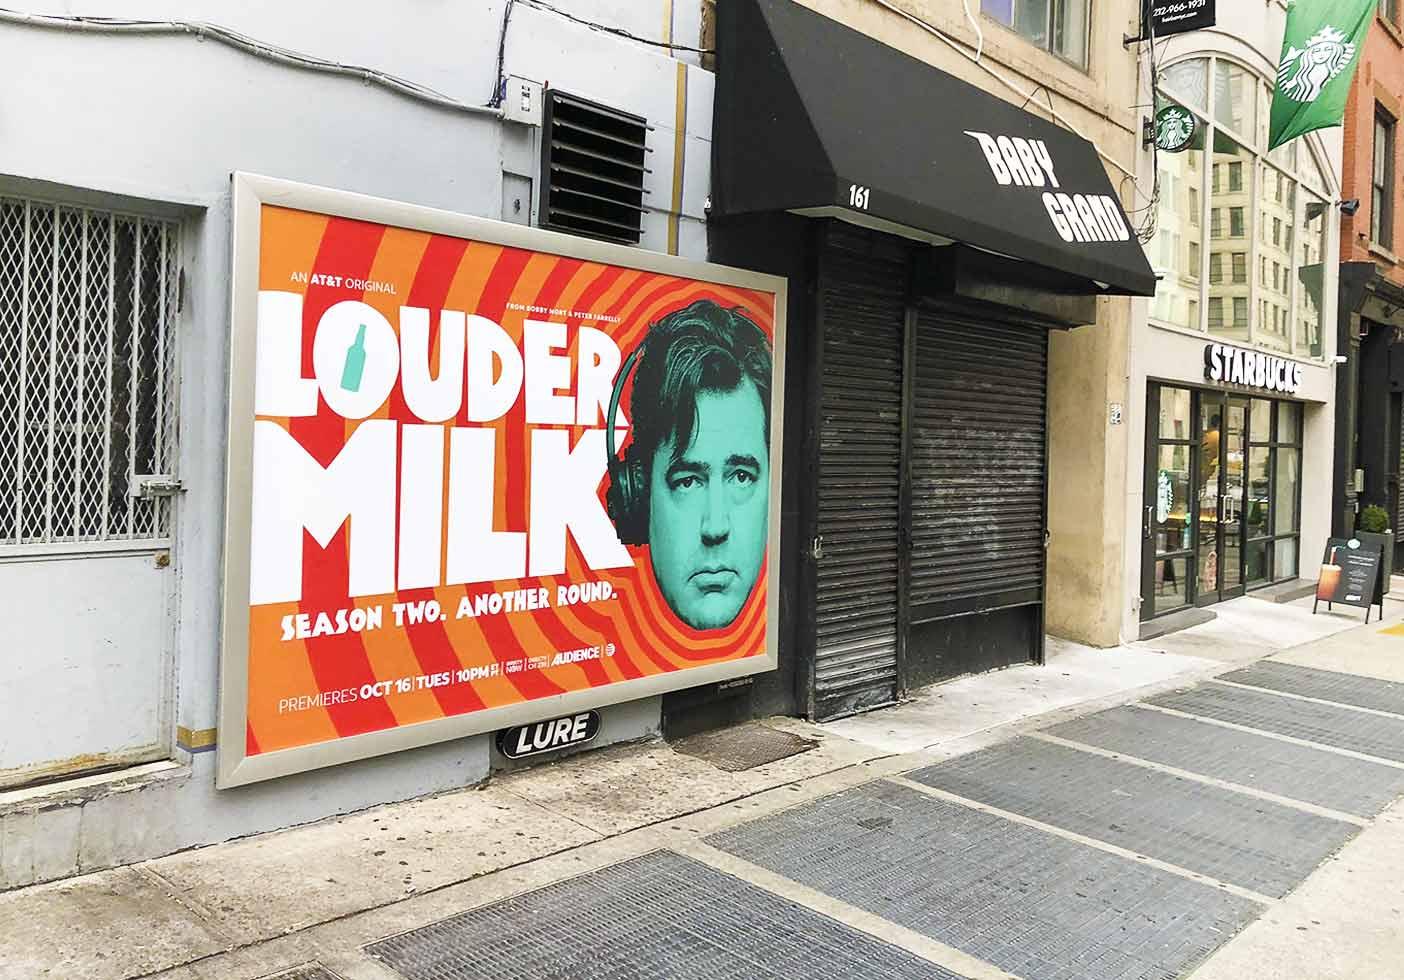 Loudermilk_4B